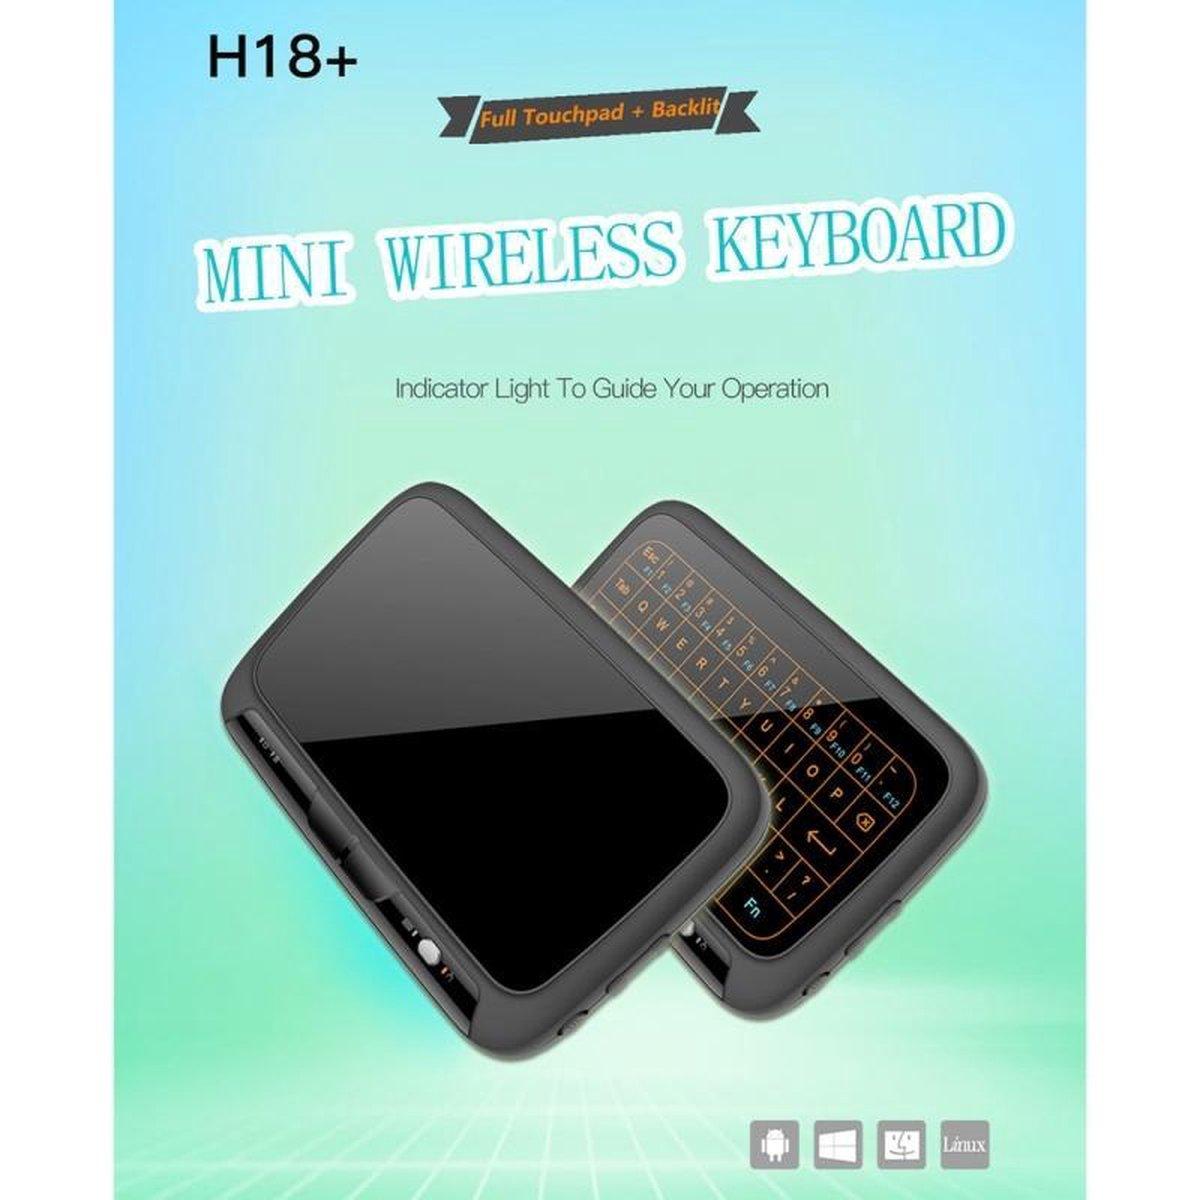 H18 + 2 4 GHz Draadloos Mini toetsenbord volledige Touchpad met verstelbare Backlight(Black) 3 niveau